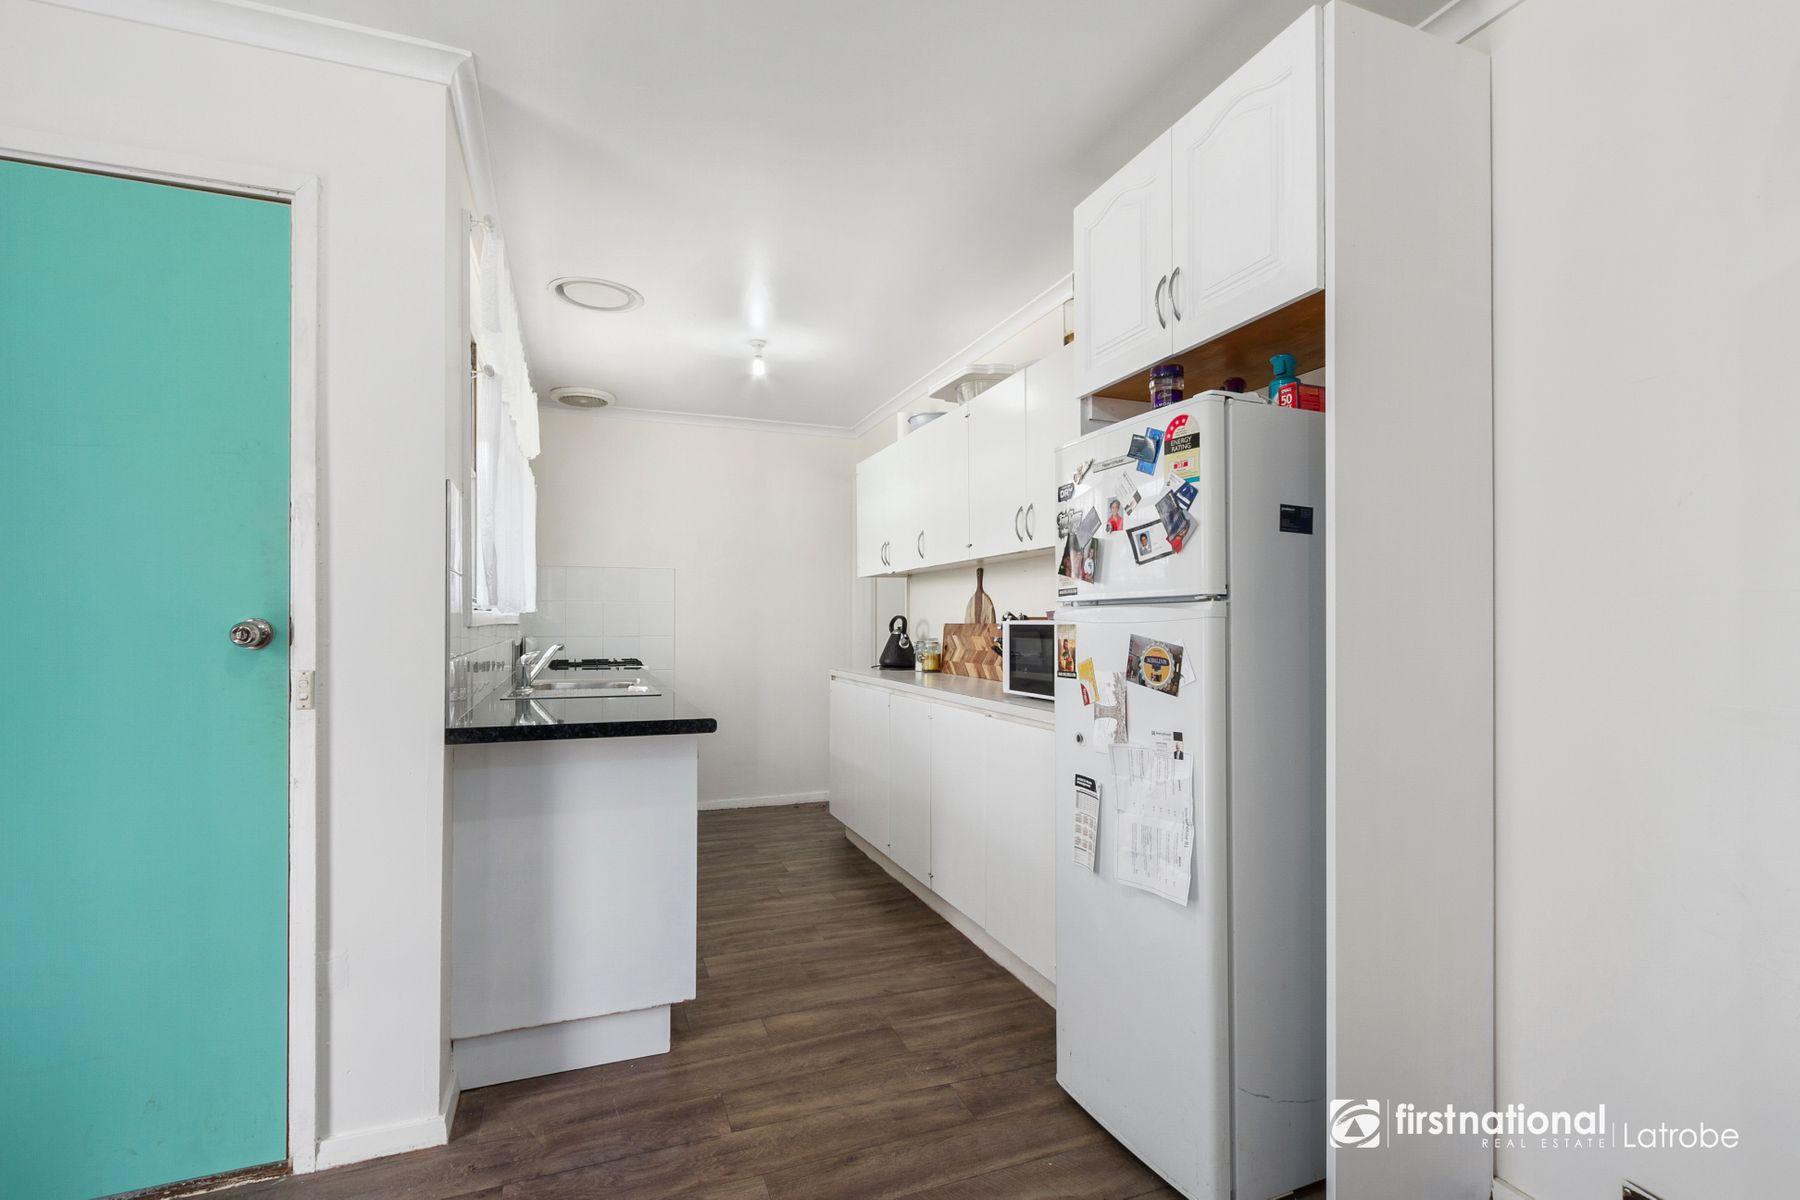 22 Latrobe Street, Rosedale, VIC 3847